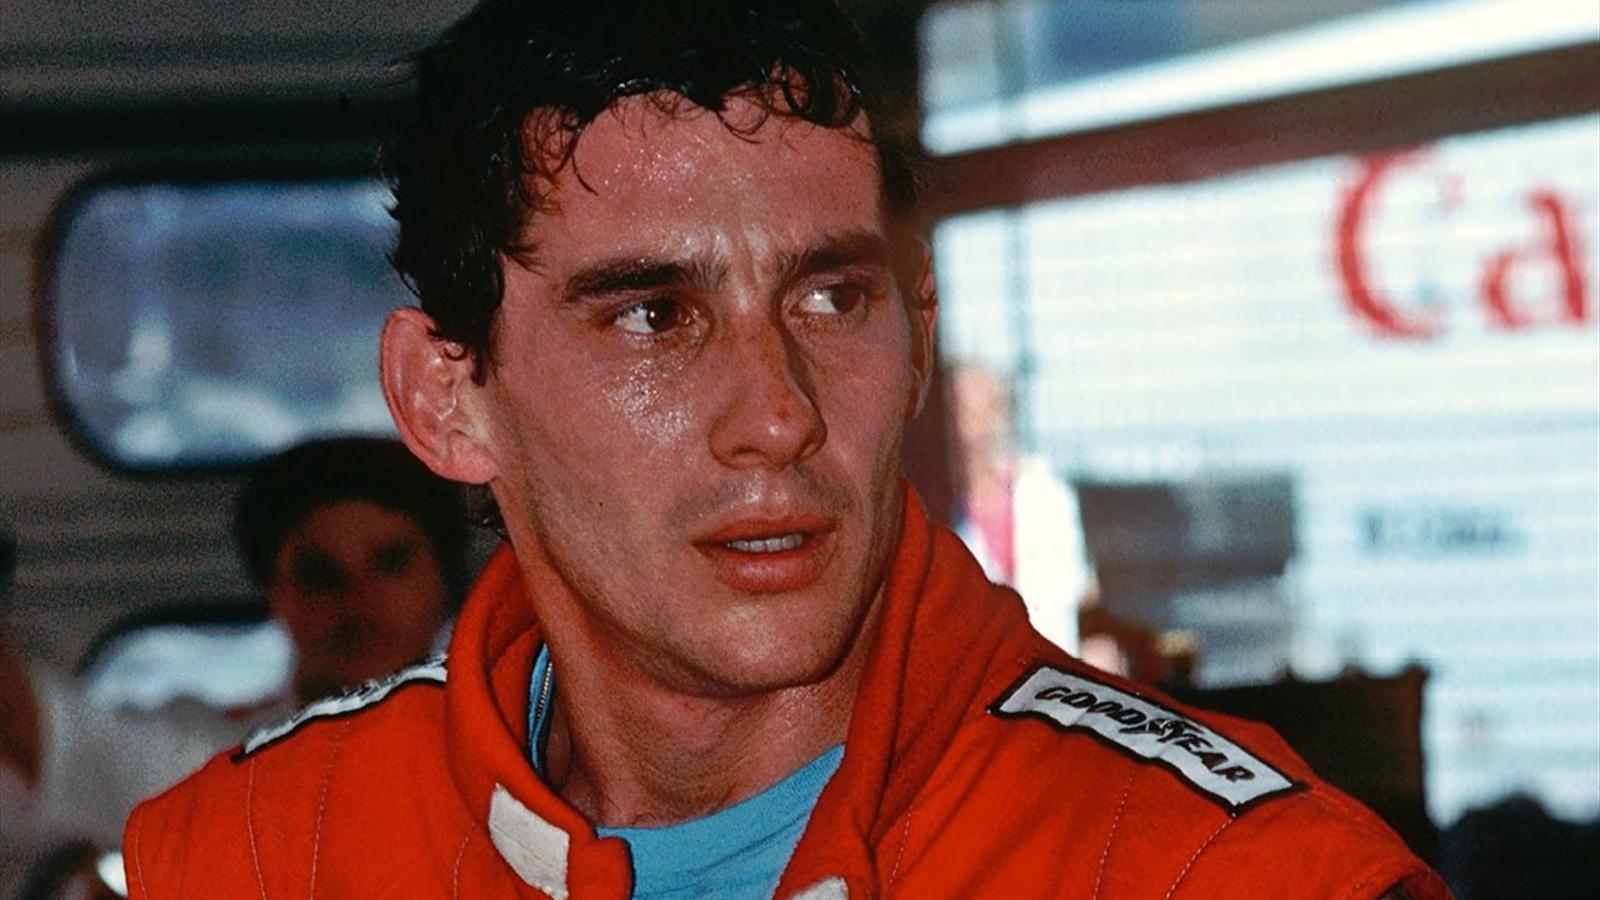 Ayrton Senna (McLaren) - Grand Prix d'Allemagne 1988 - Paul-Henri Cahier